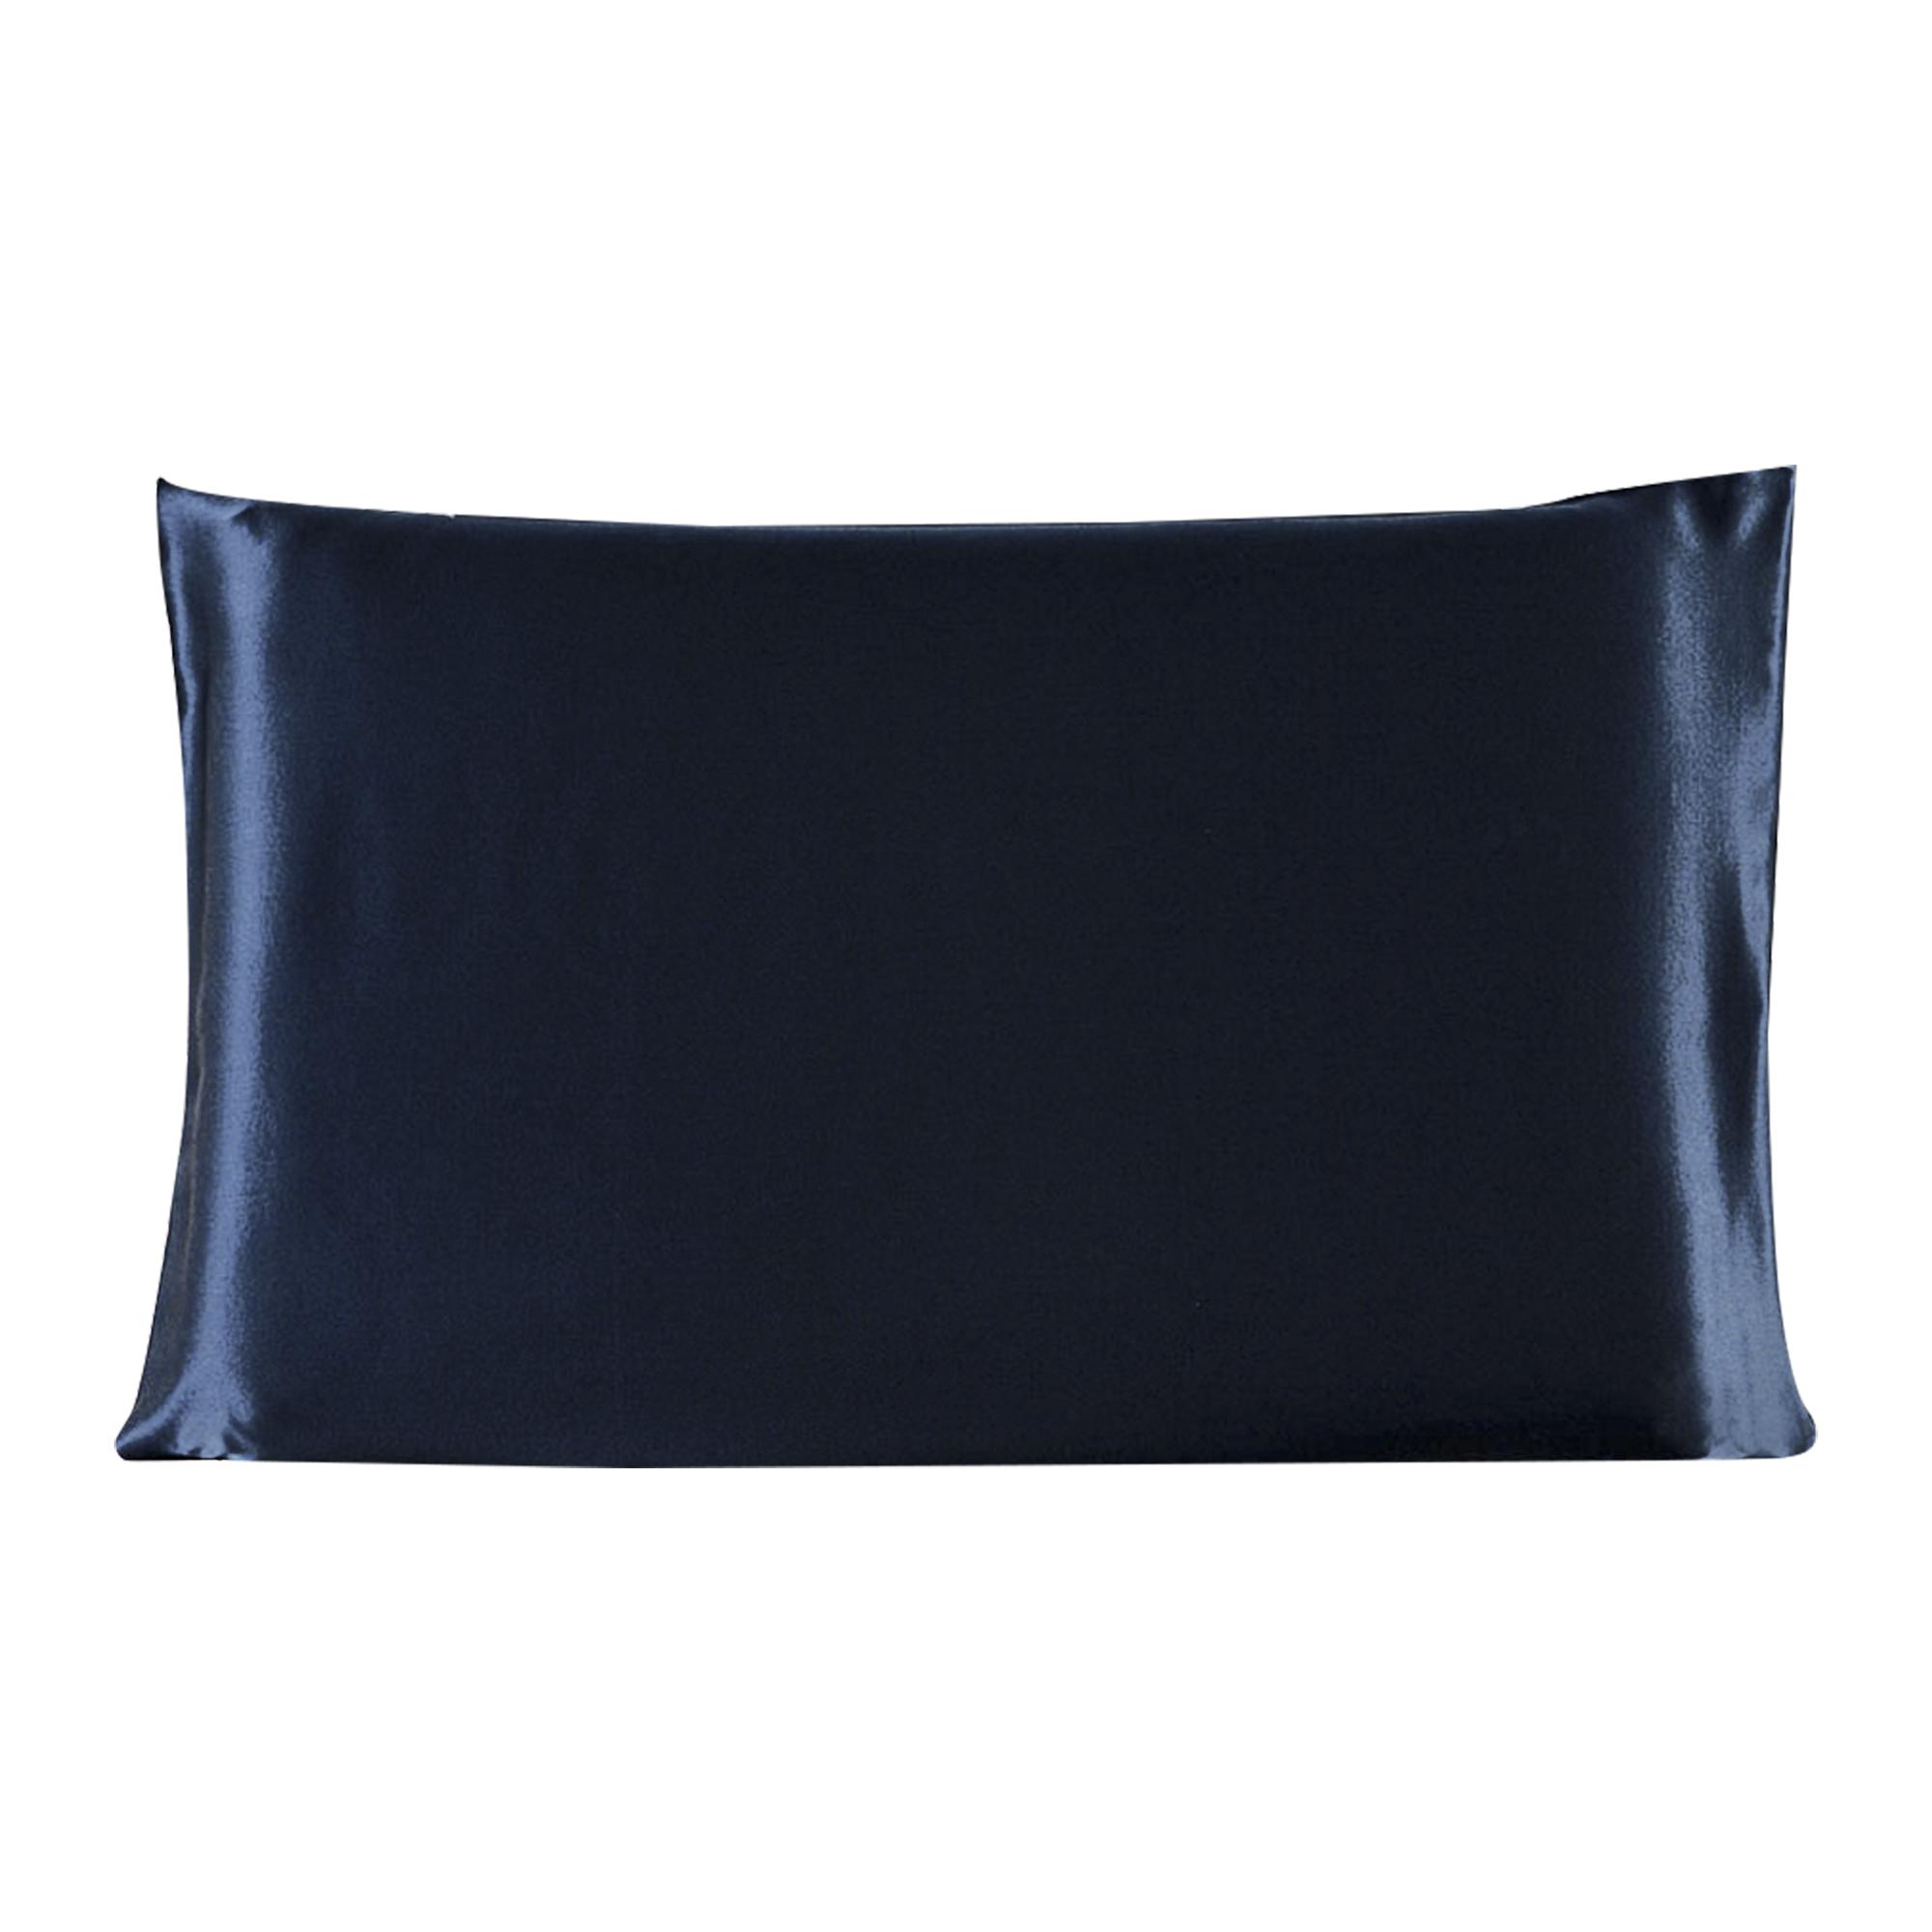 100% Mulberry Silk Fabric Pillow Case Pillowcase Royal Blue Standard Size